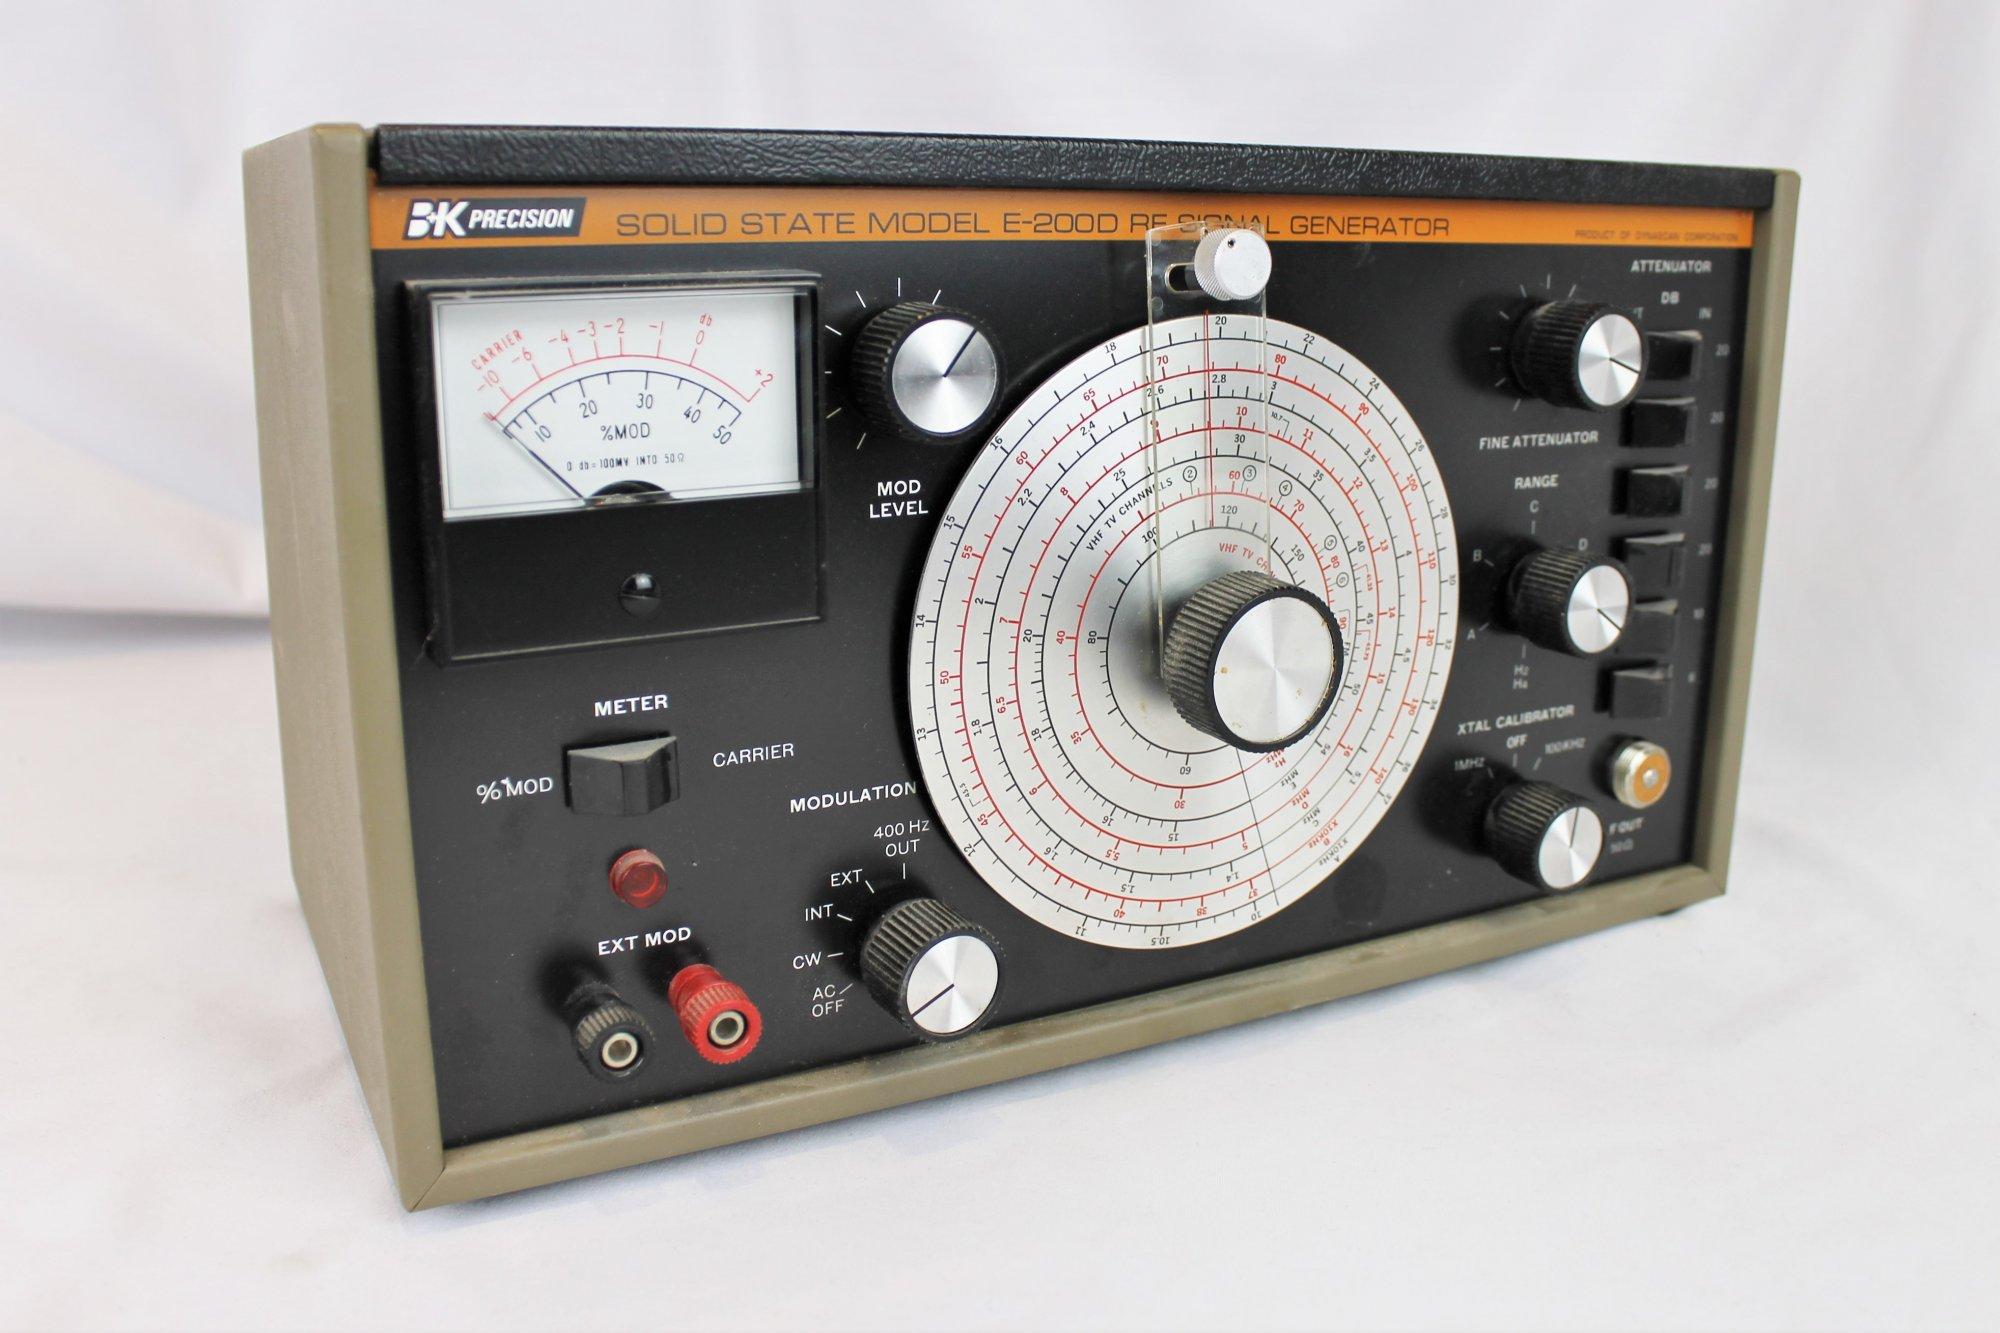 B&K Precision Solid State Model E-2000 RF Signal Generator